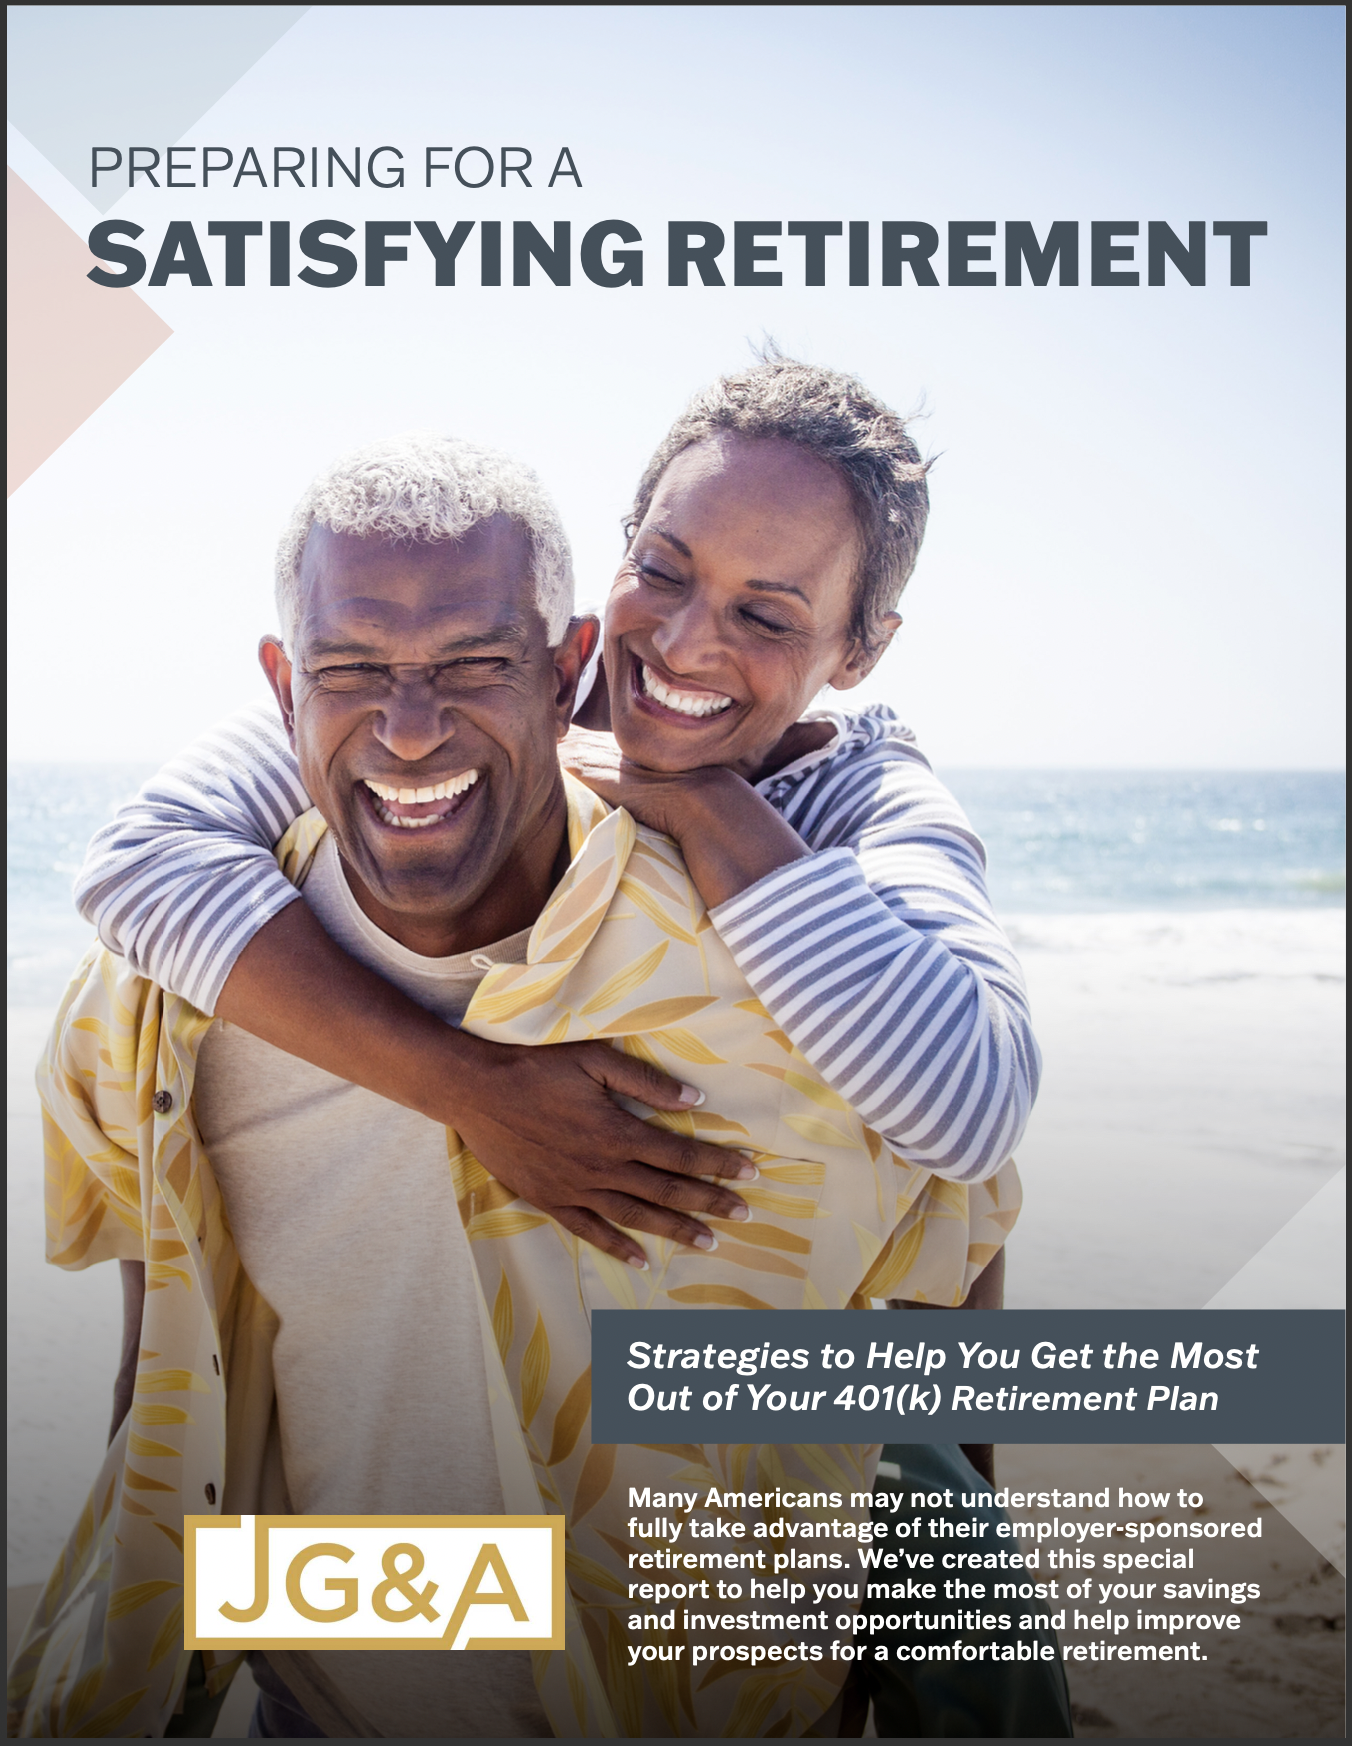 Preparing for a Satisfying Retirement Thumbnail